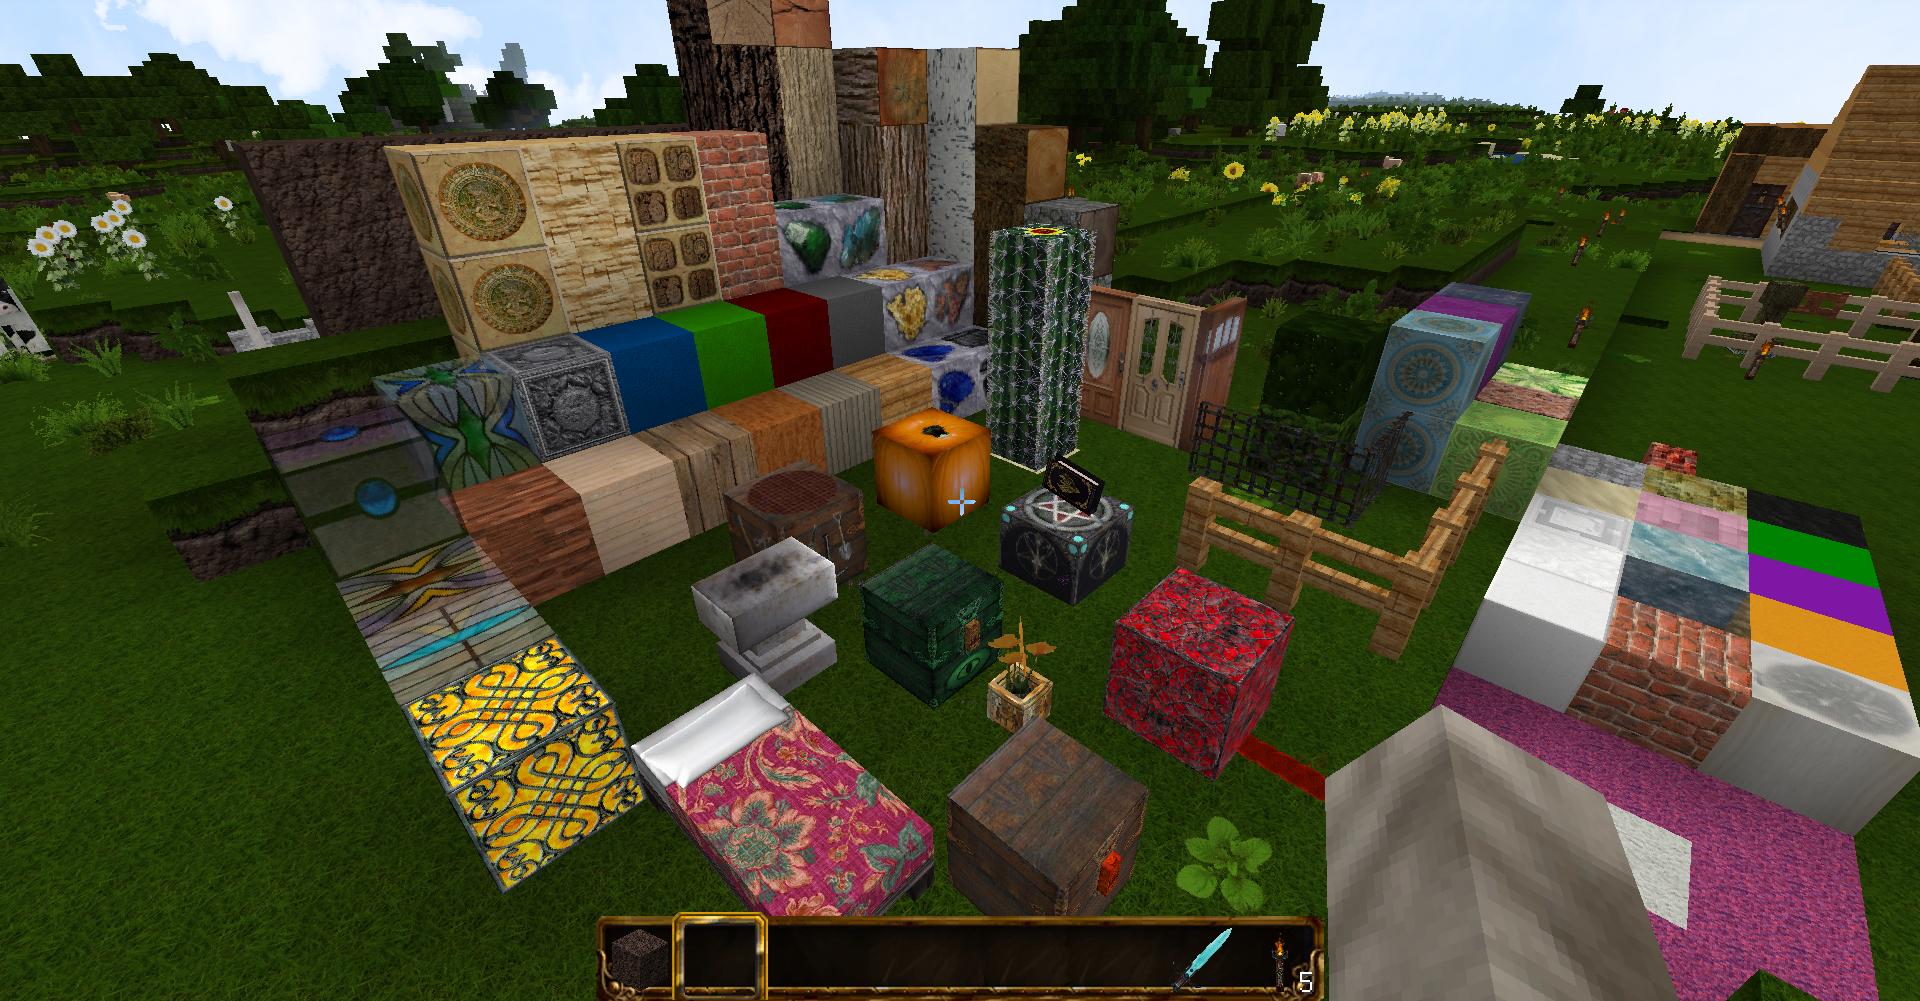 【MOD】大容量な鉱石バックパック!『Deep Pockets』【Minecraft】 | れねんクラフト